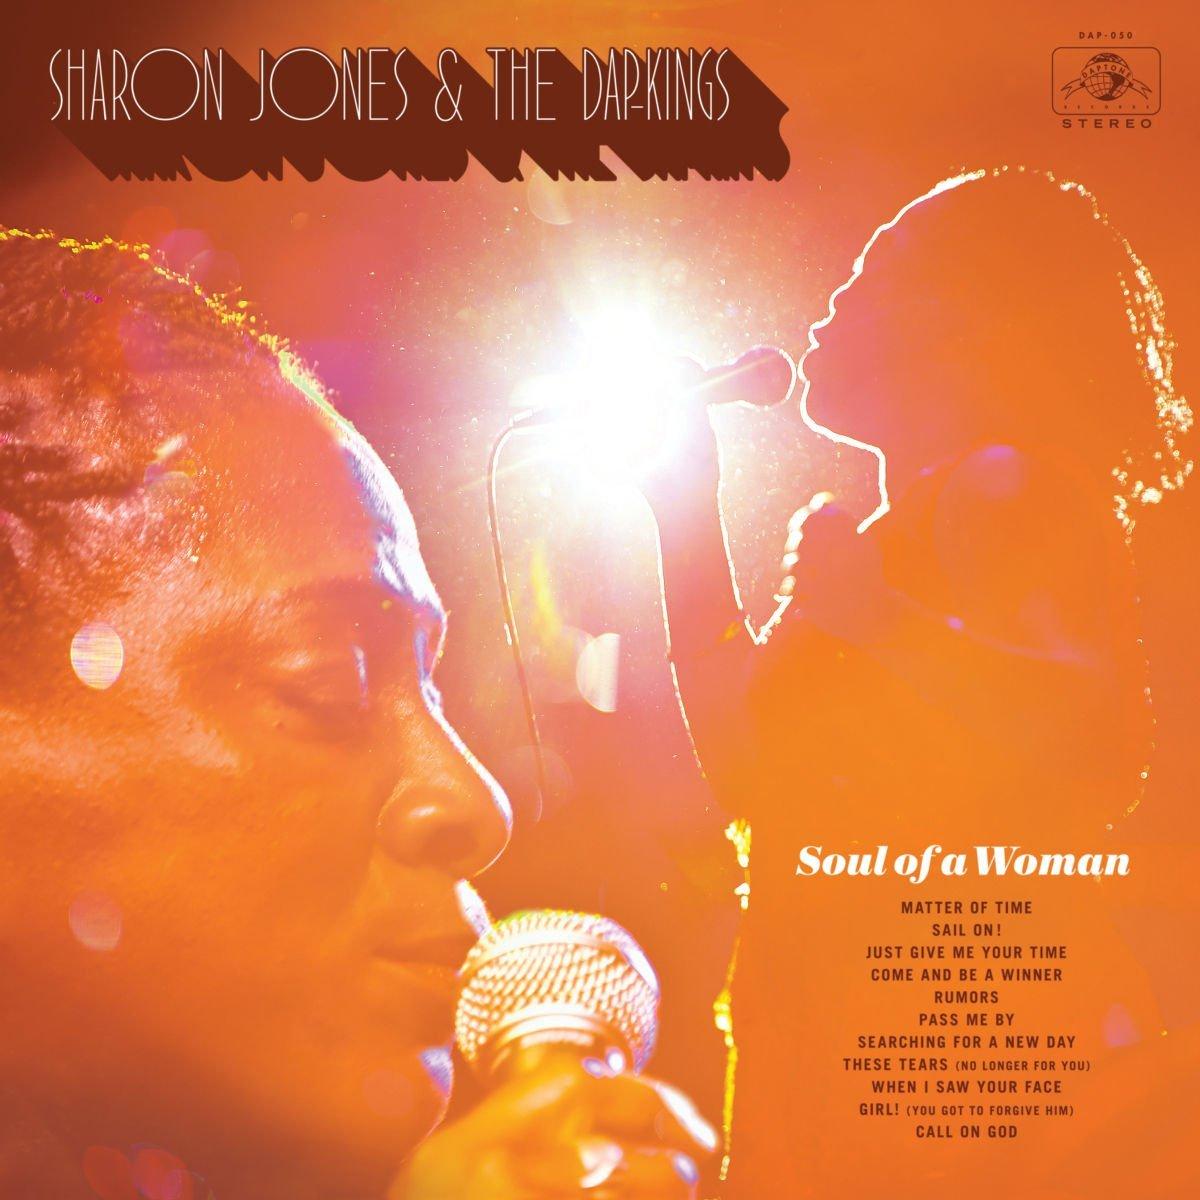 Sharon Jones & The Dap-Kings: Soul Of A Woman [Album Review]